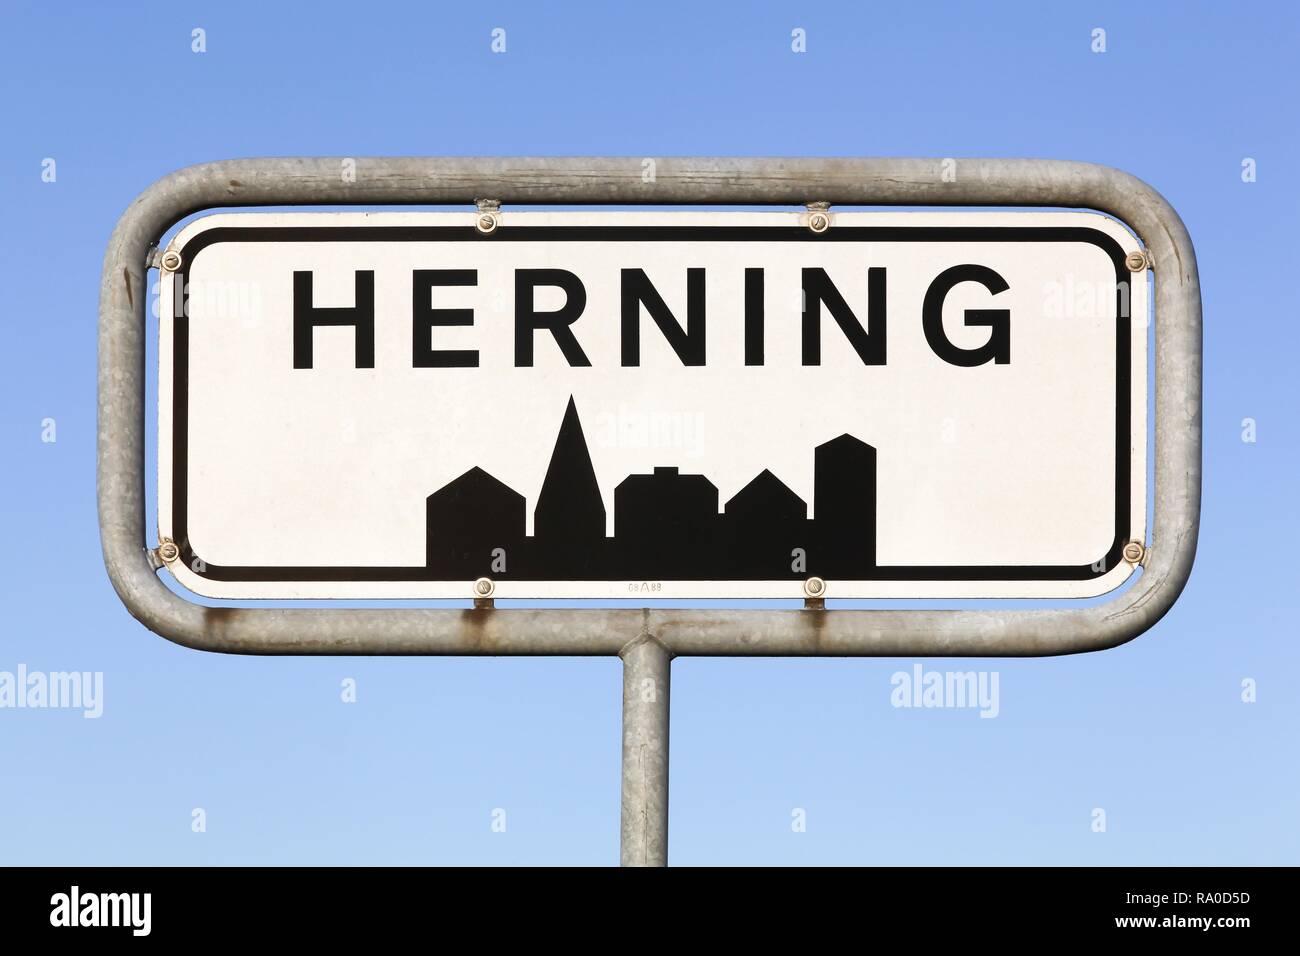 Herning city road sign in Denmark Stock Photo